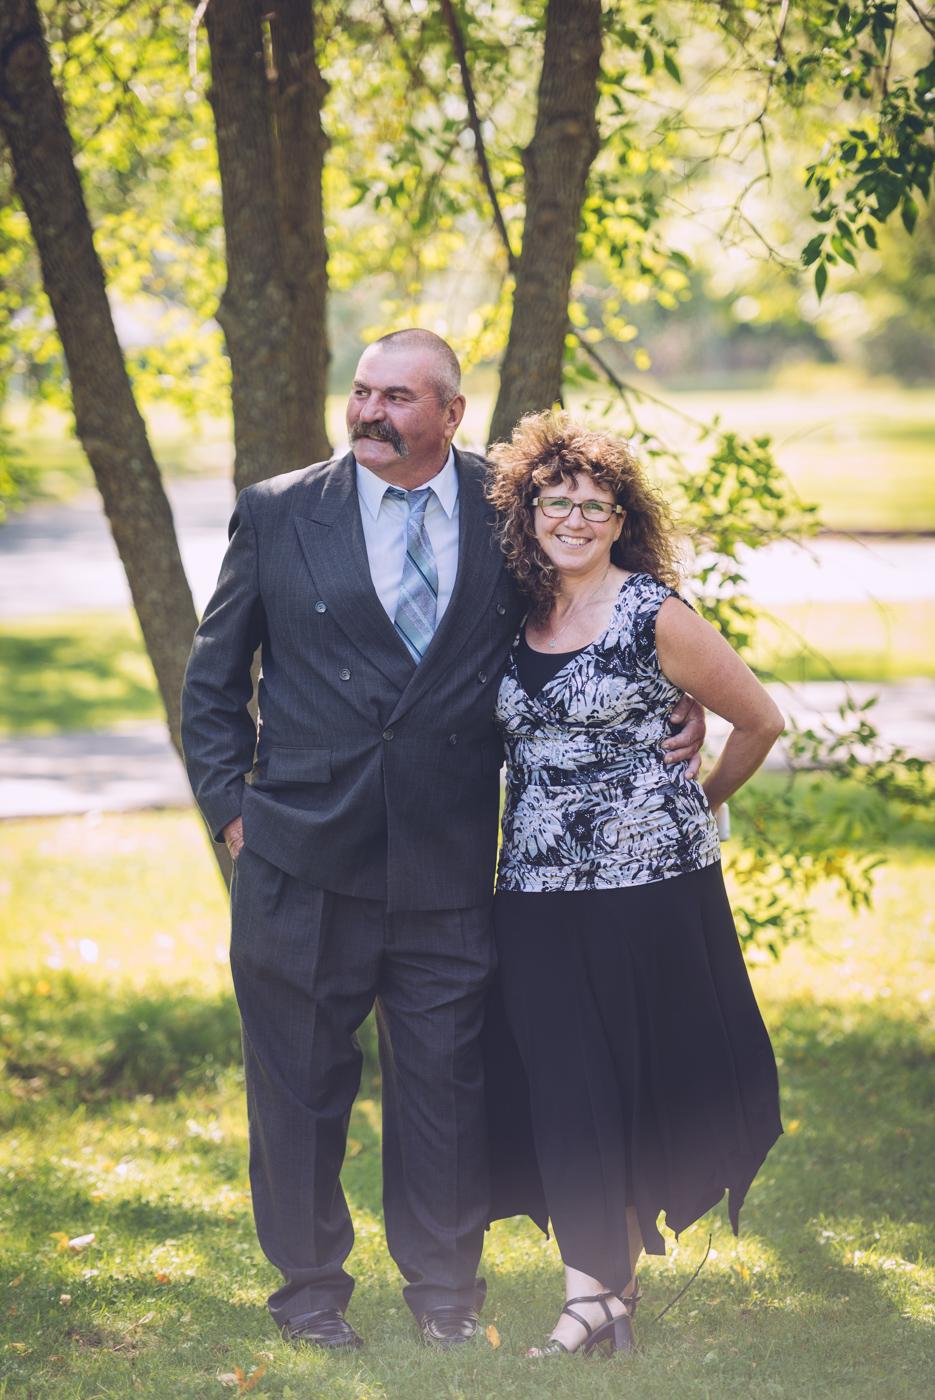 adam_eden_wedding_blog10.jpg